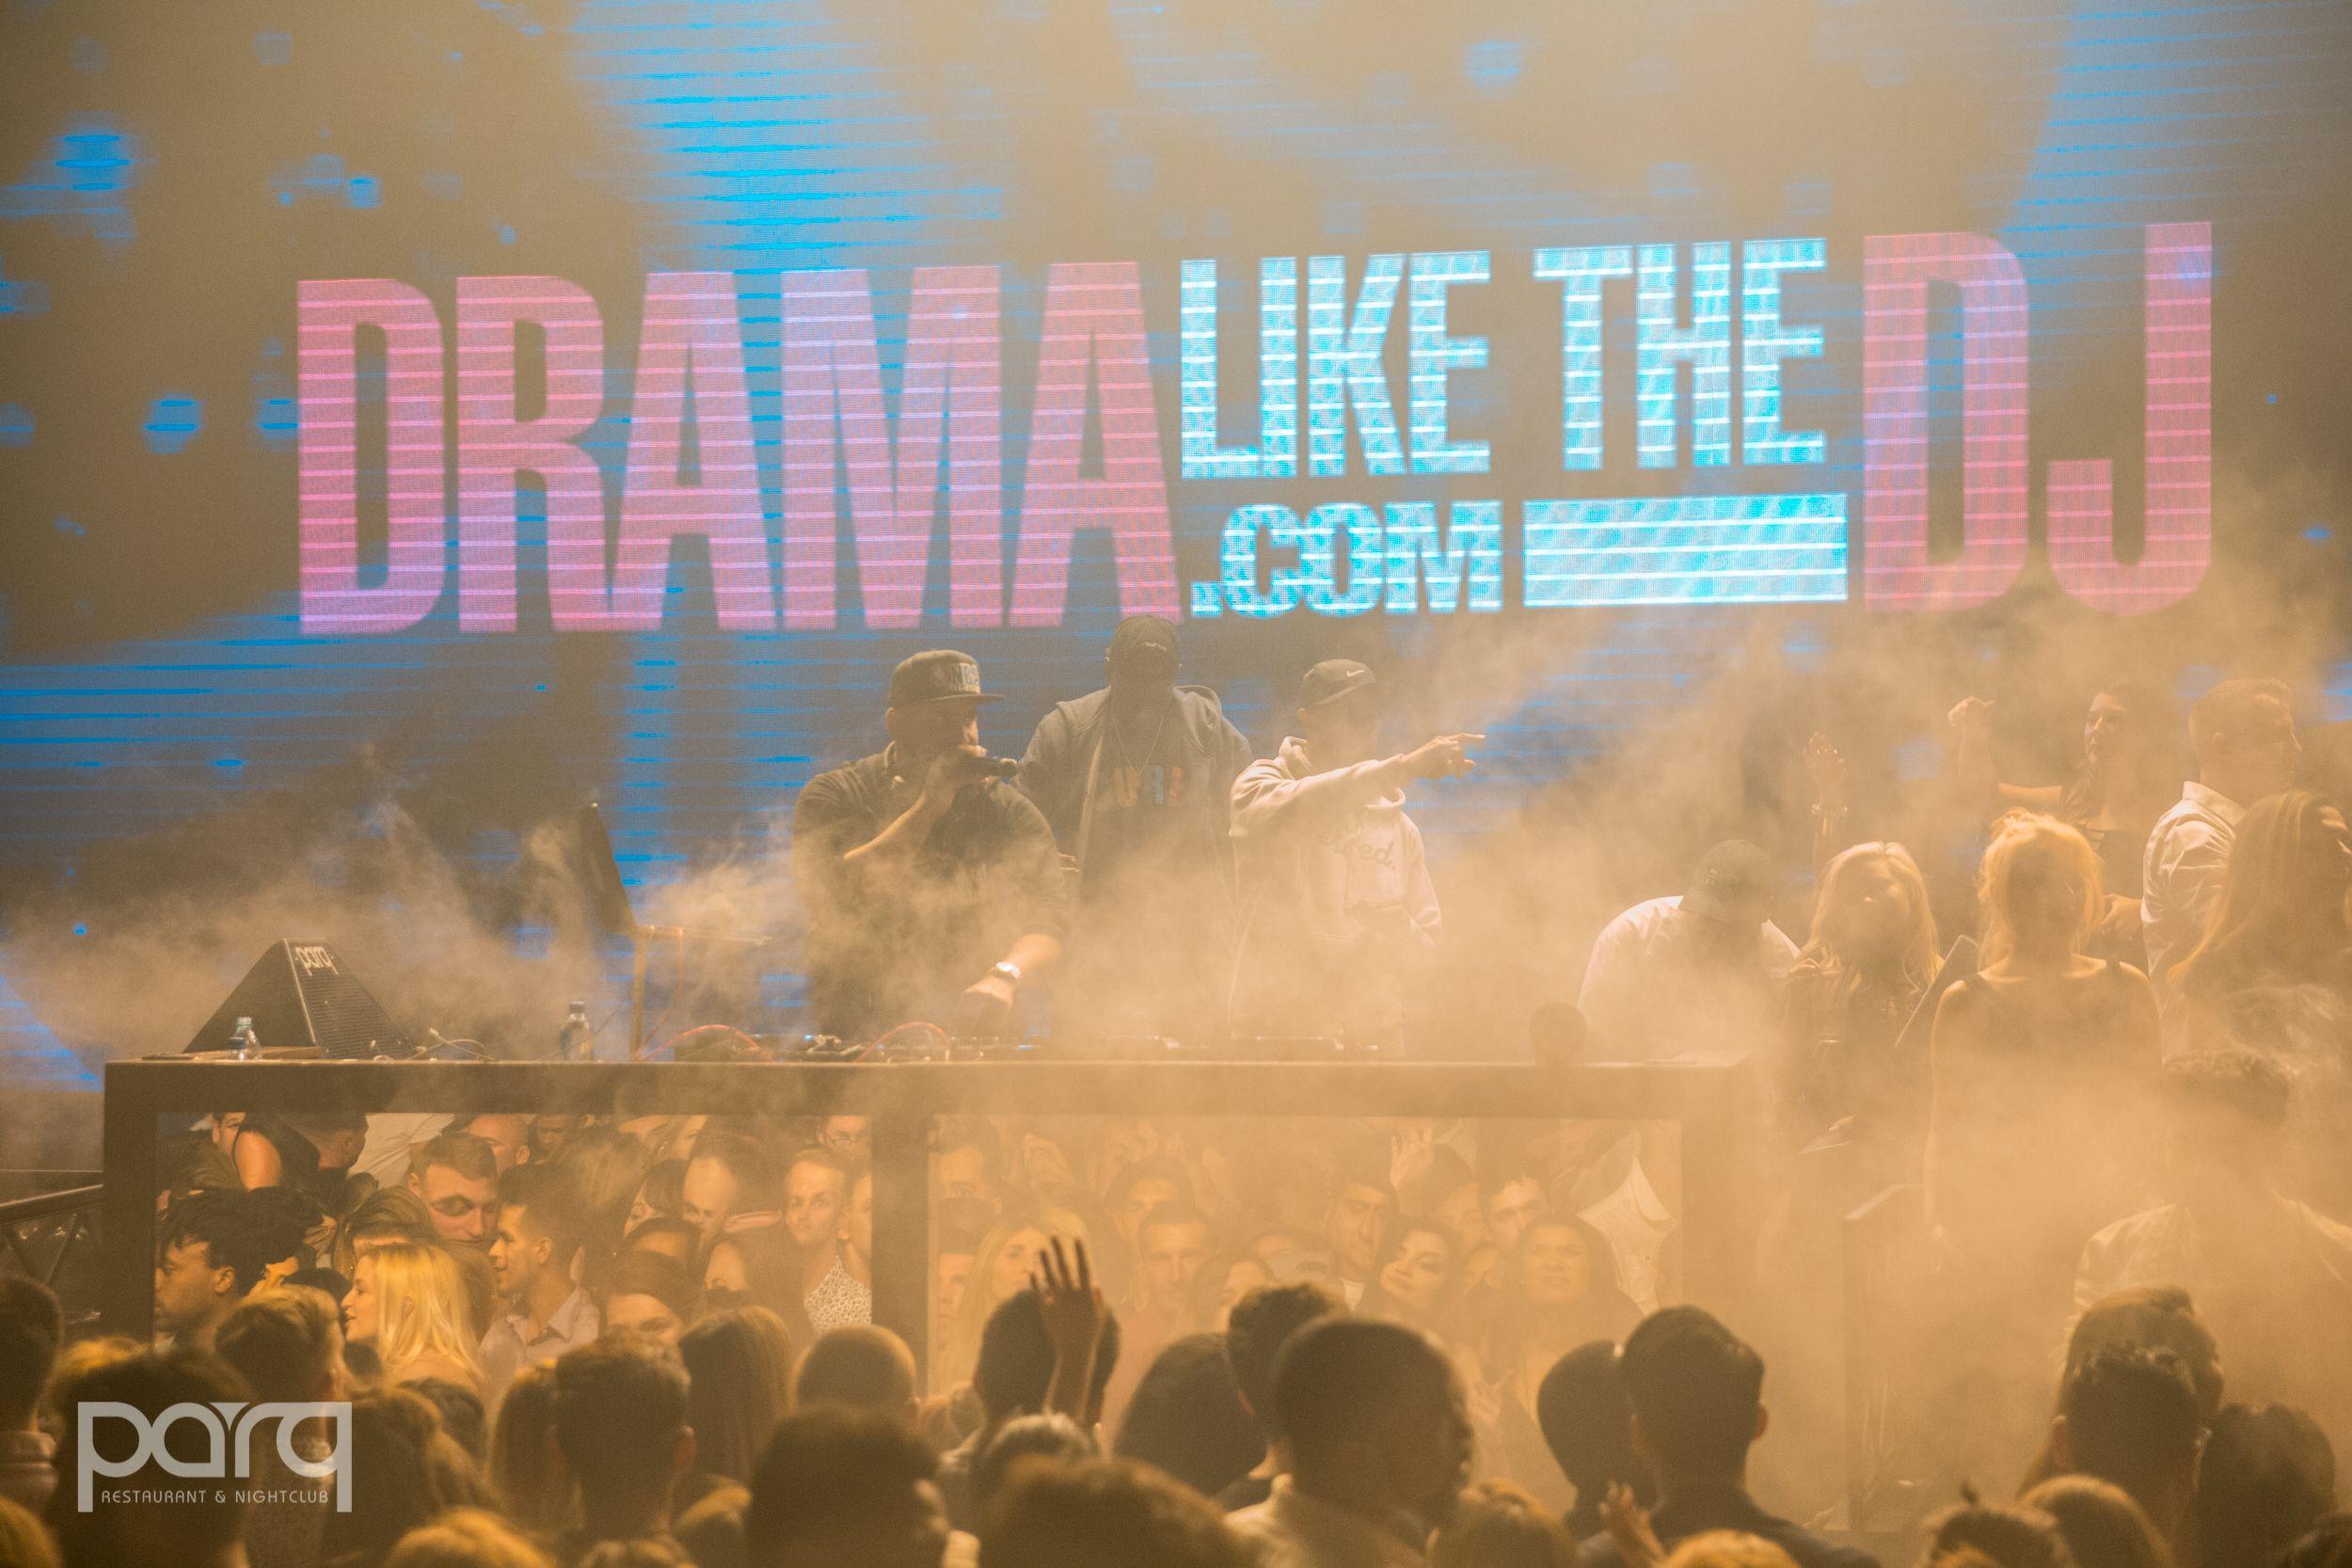 02.18.18 Parq - DJ Drama-1.jpg